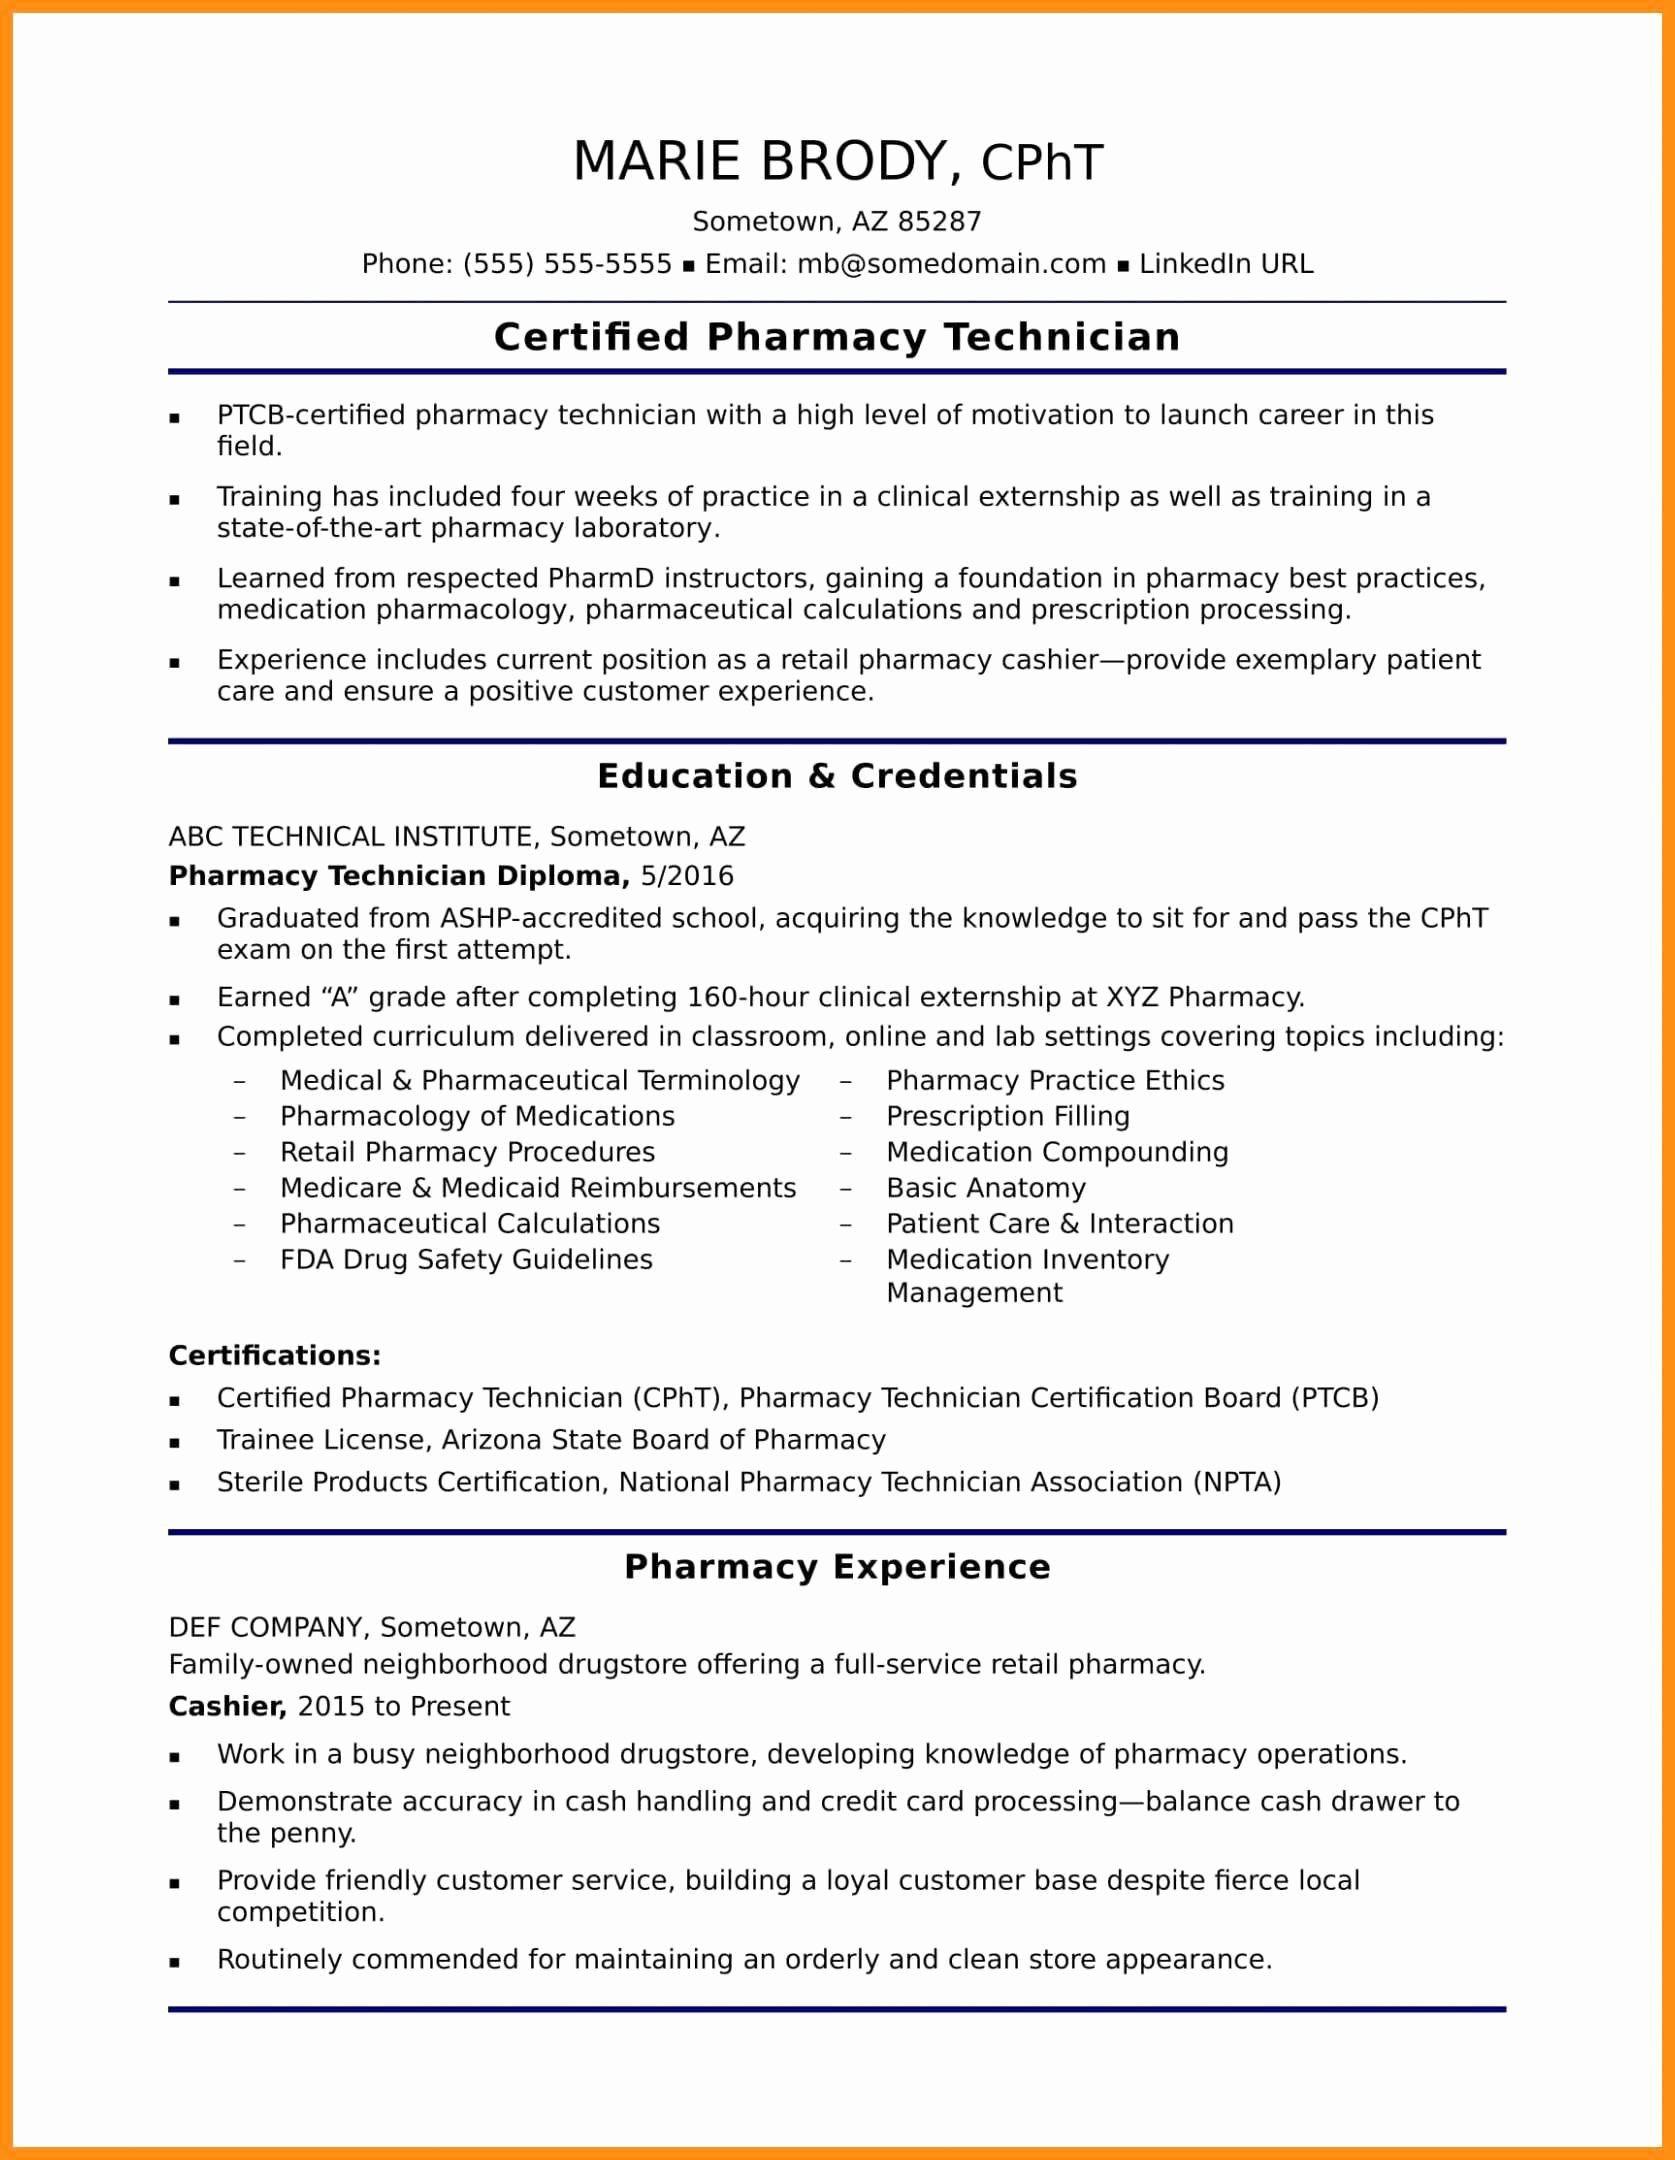 H1b Premium Processing Resume Lovely Intern Resume Example Best Pharmacist Resume Template Resume Best Resume Template Good Resume Examples